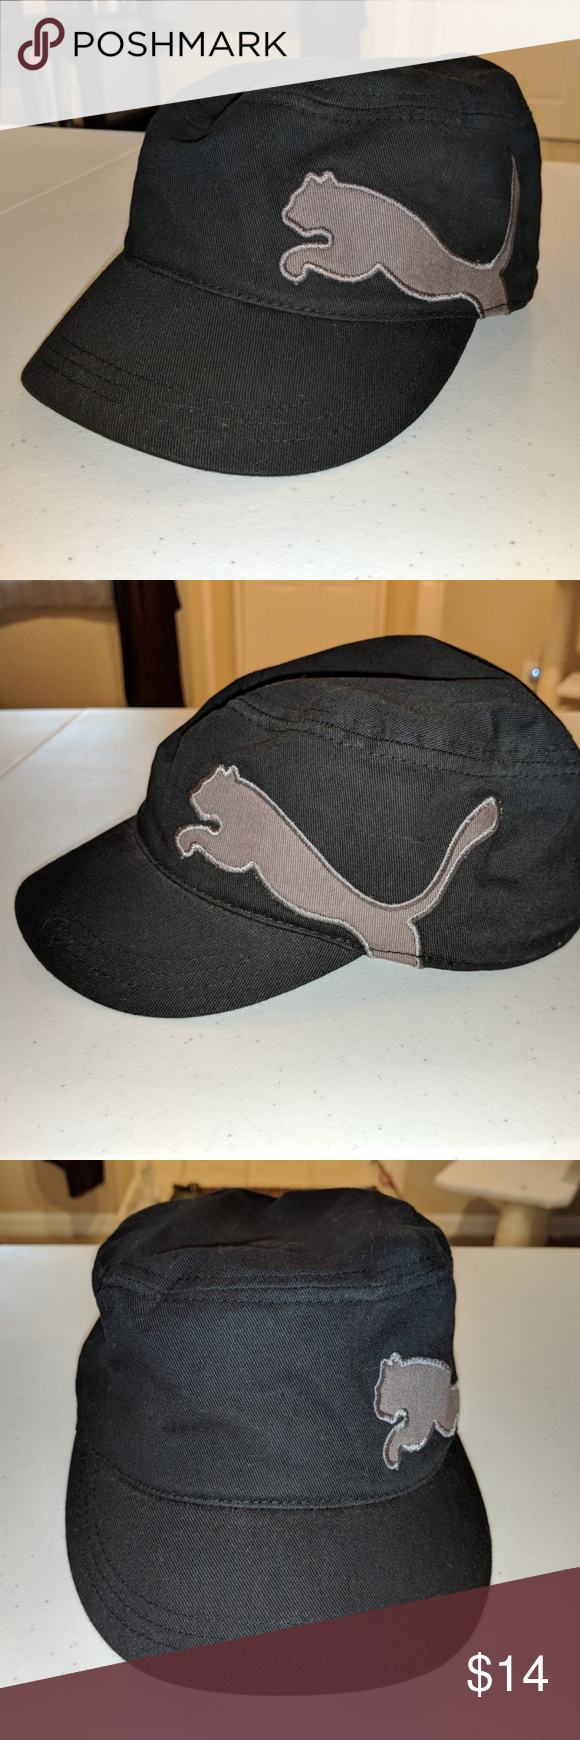 23d2571440f PUMA Leap Adjustable Military Cap - Like New - Black military style cap -  Puma Cat